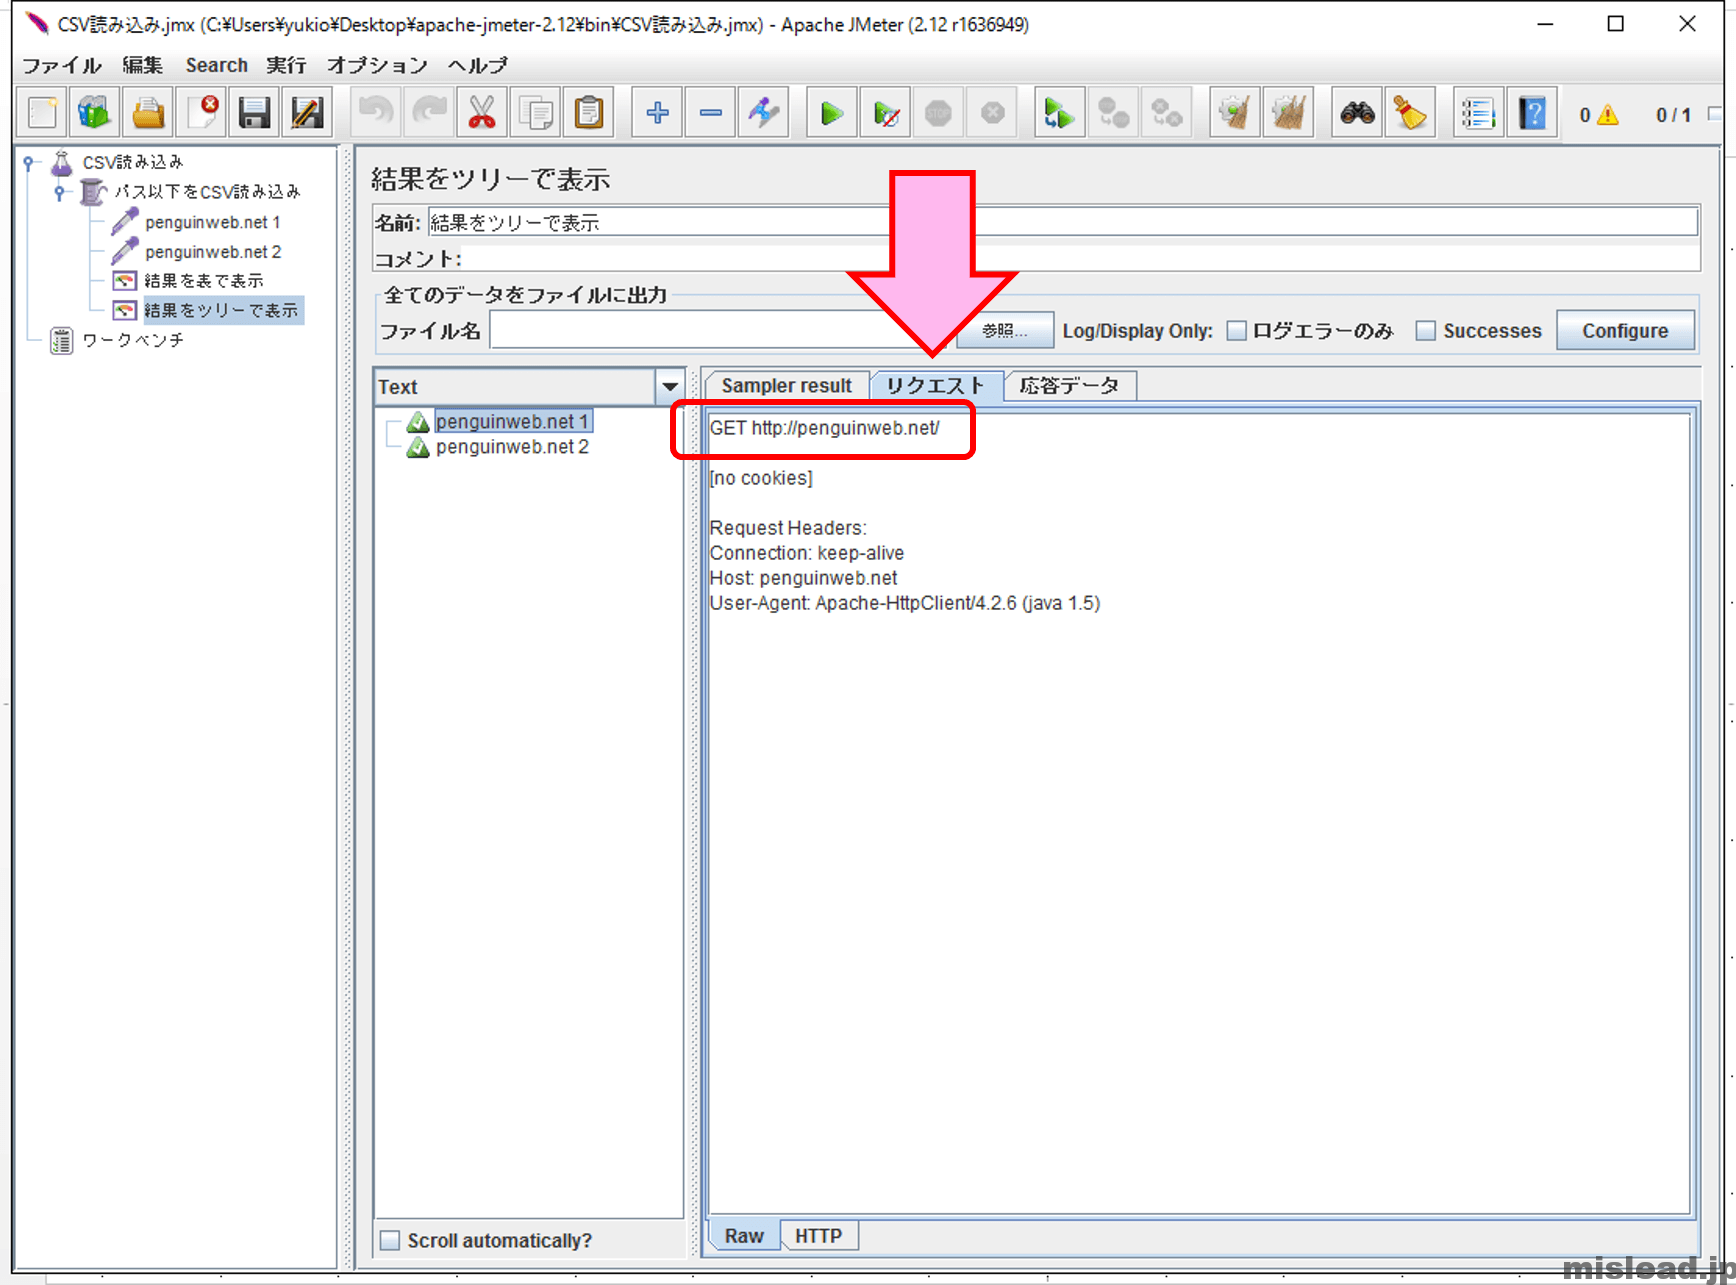 JMeter CSV読み込み用 結果をツリーで表示 リクエストタブ